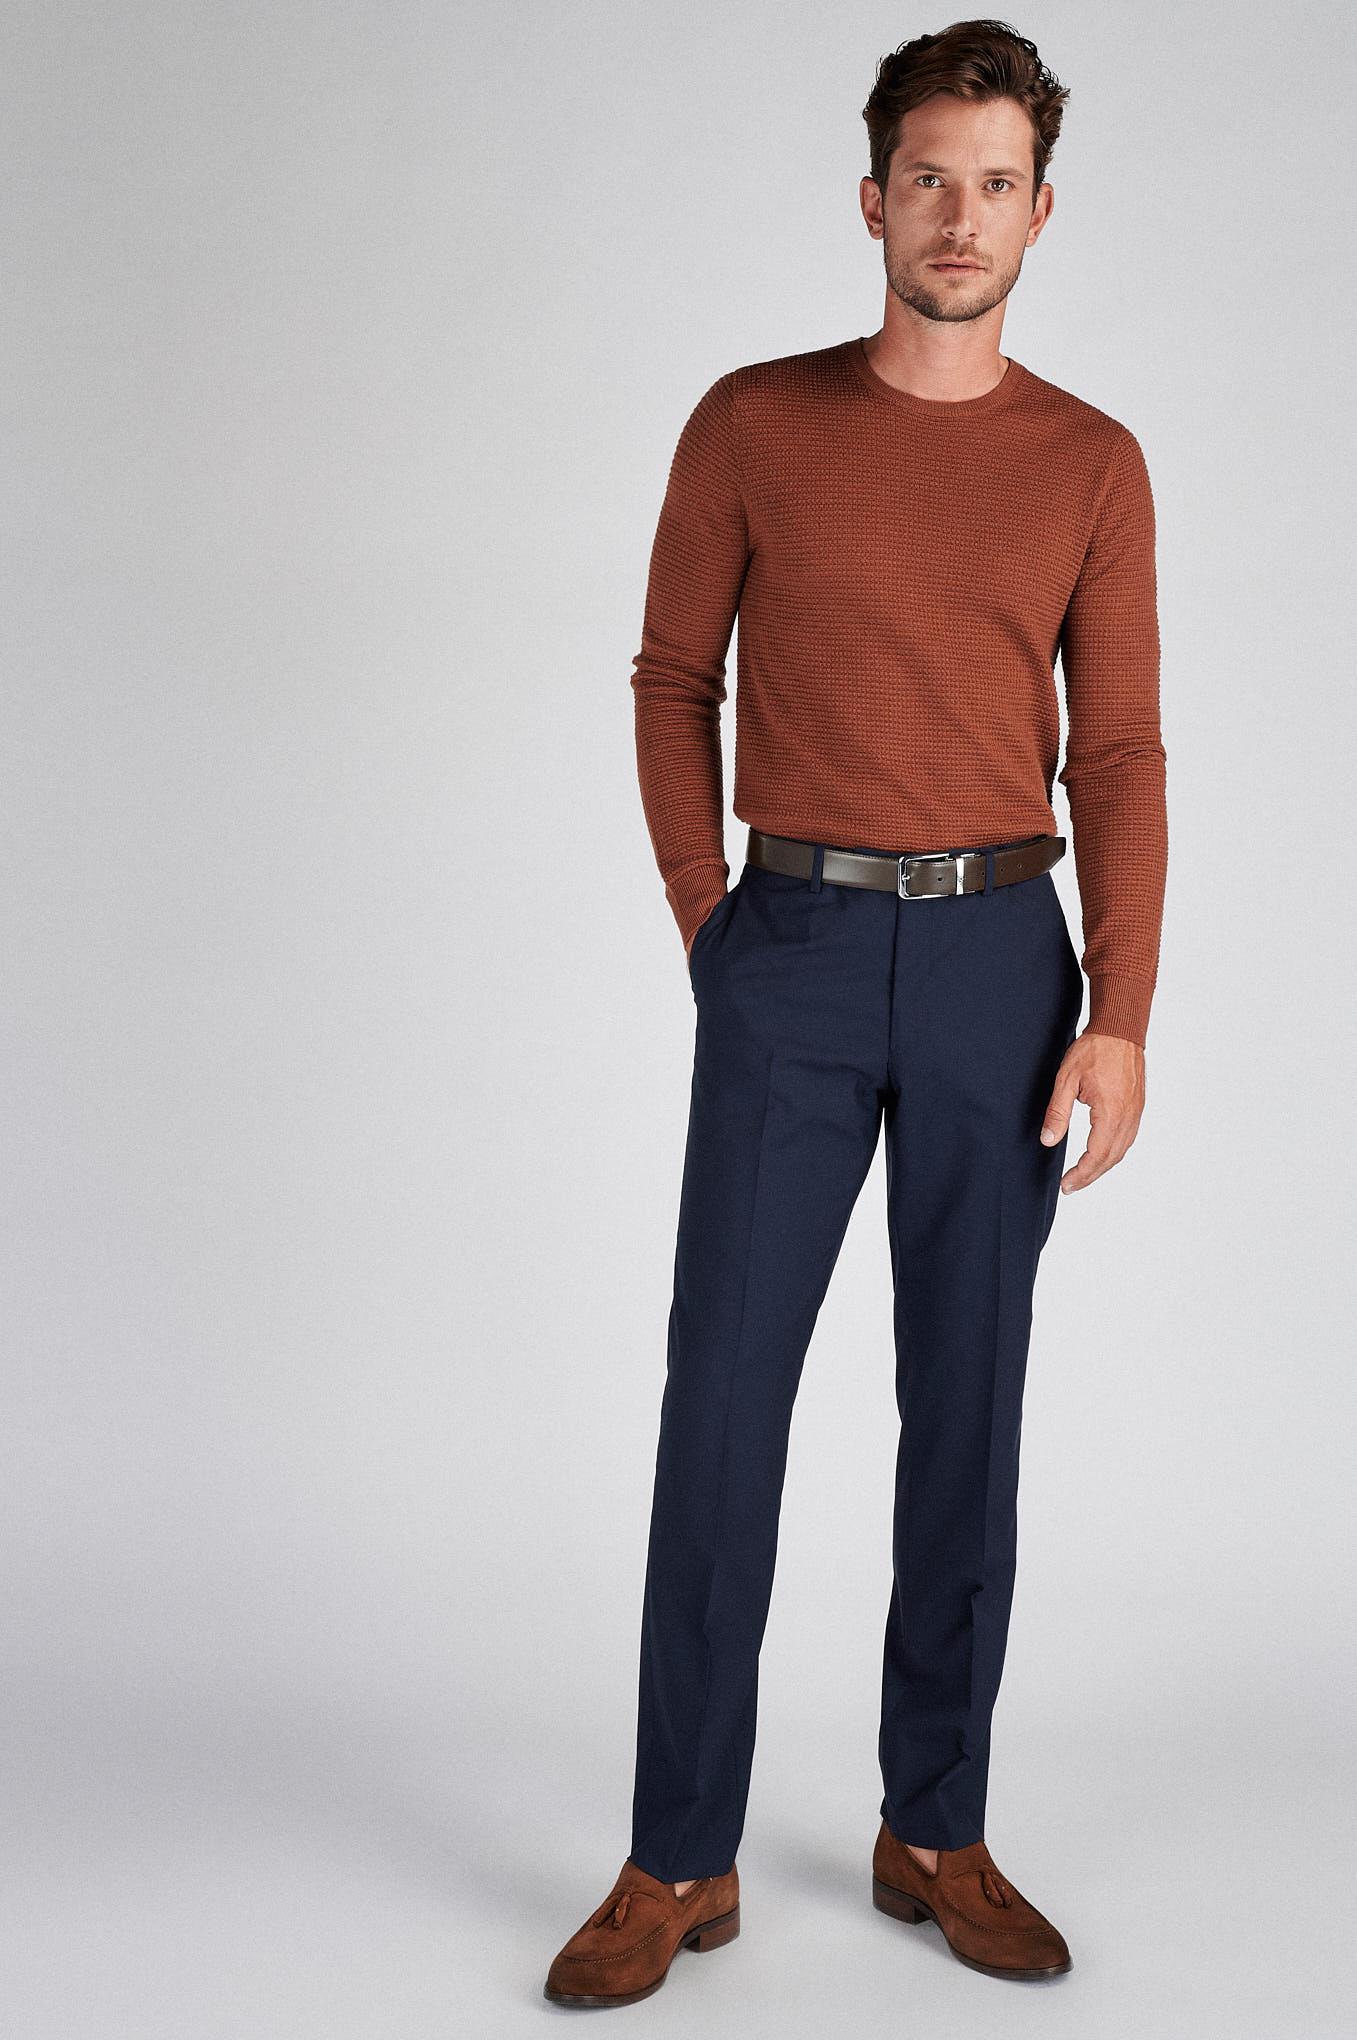 Sweater Caramel Casual Man